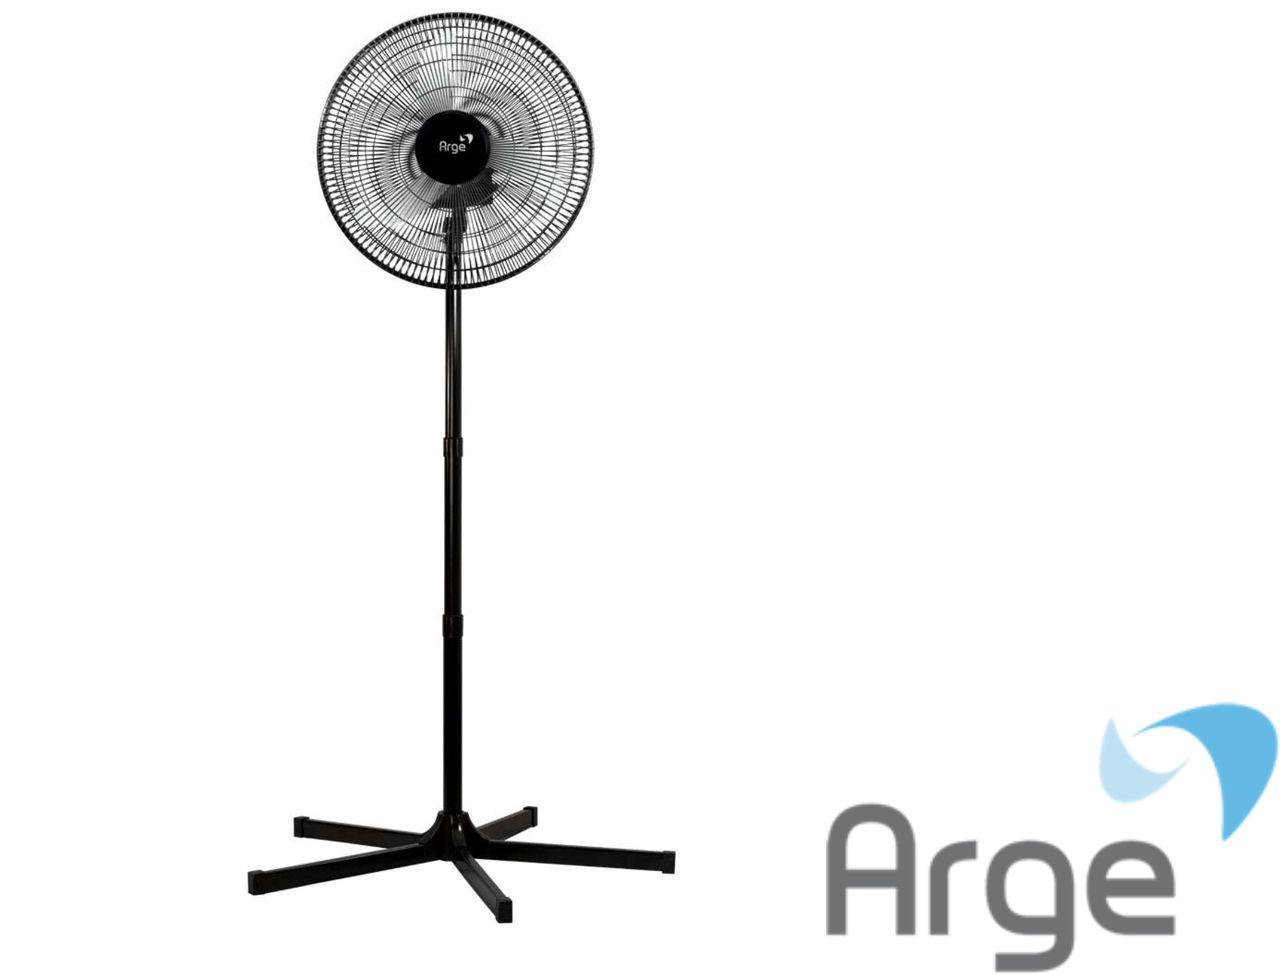 Ventilador coluna ARGE - 50CM TWISTER BIVOLT